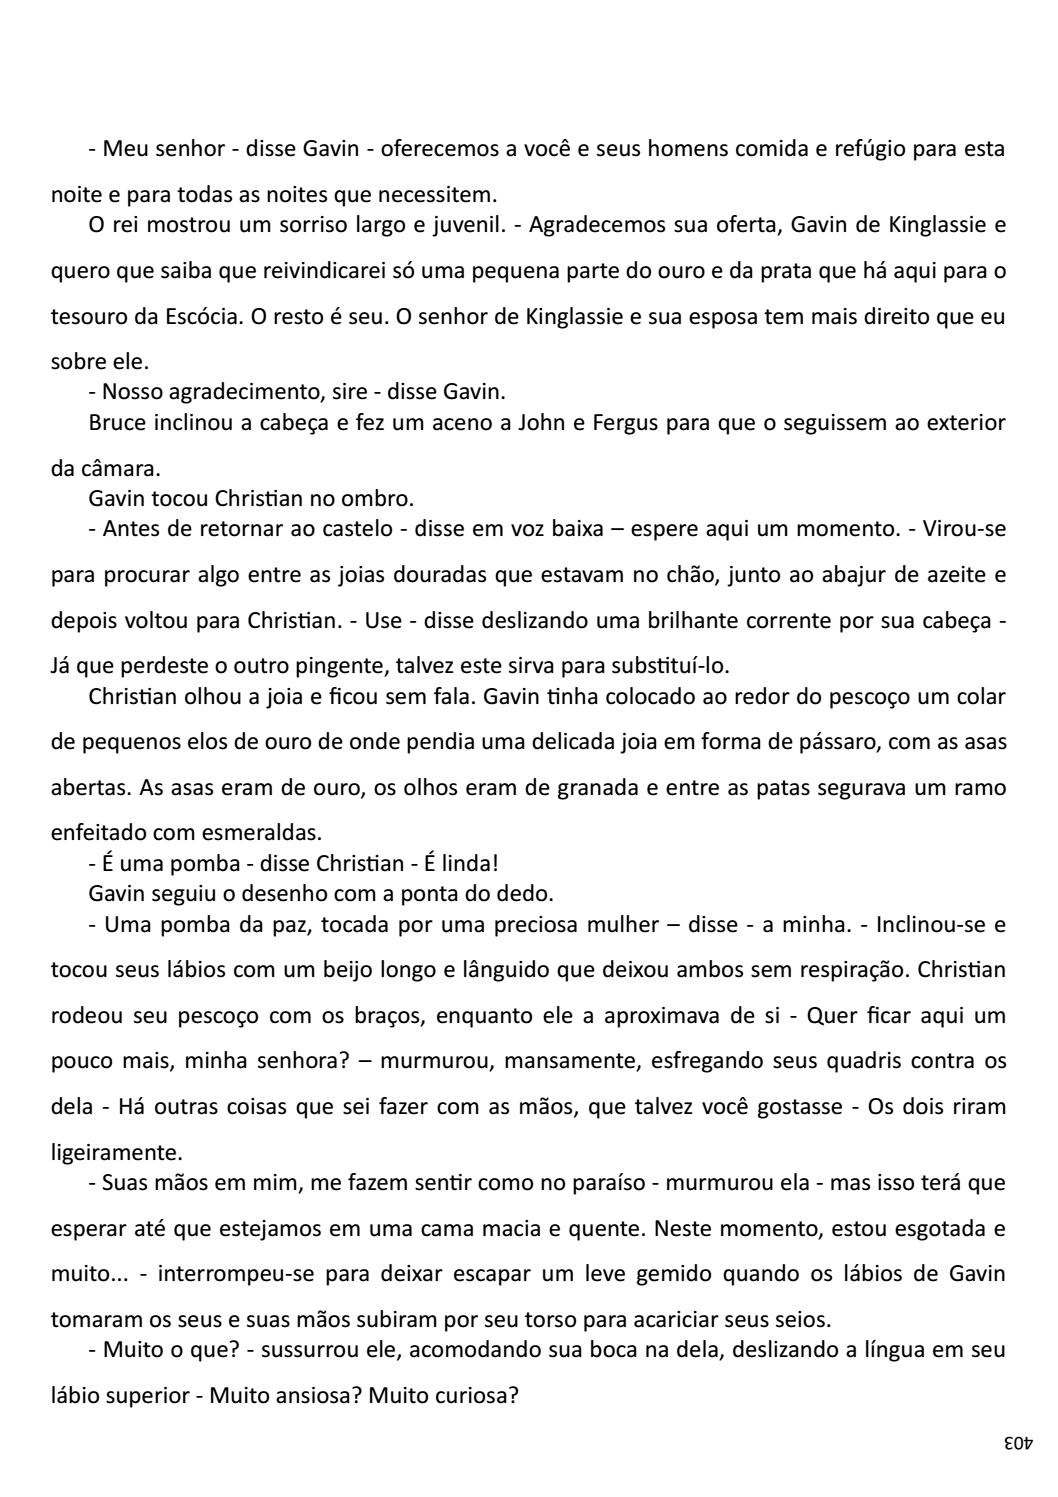 A Lenda De Kinglassie By Patricia Martins Fonseca Issuu